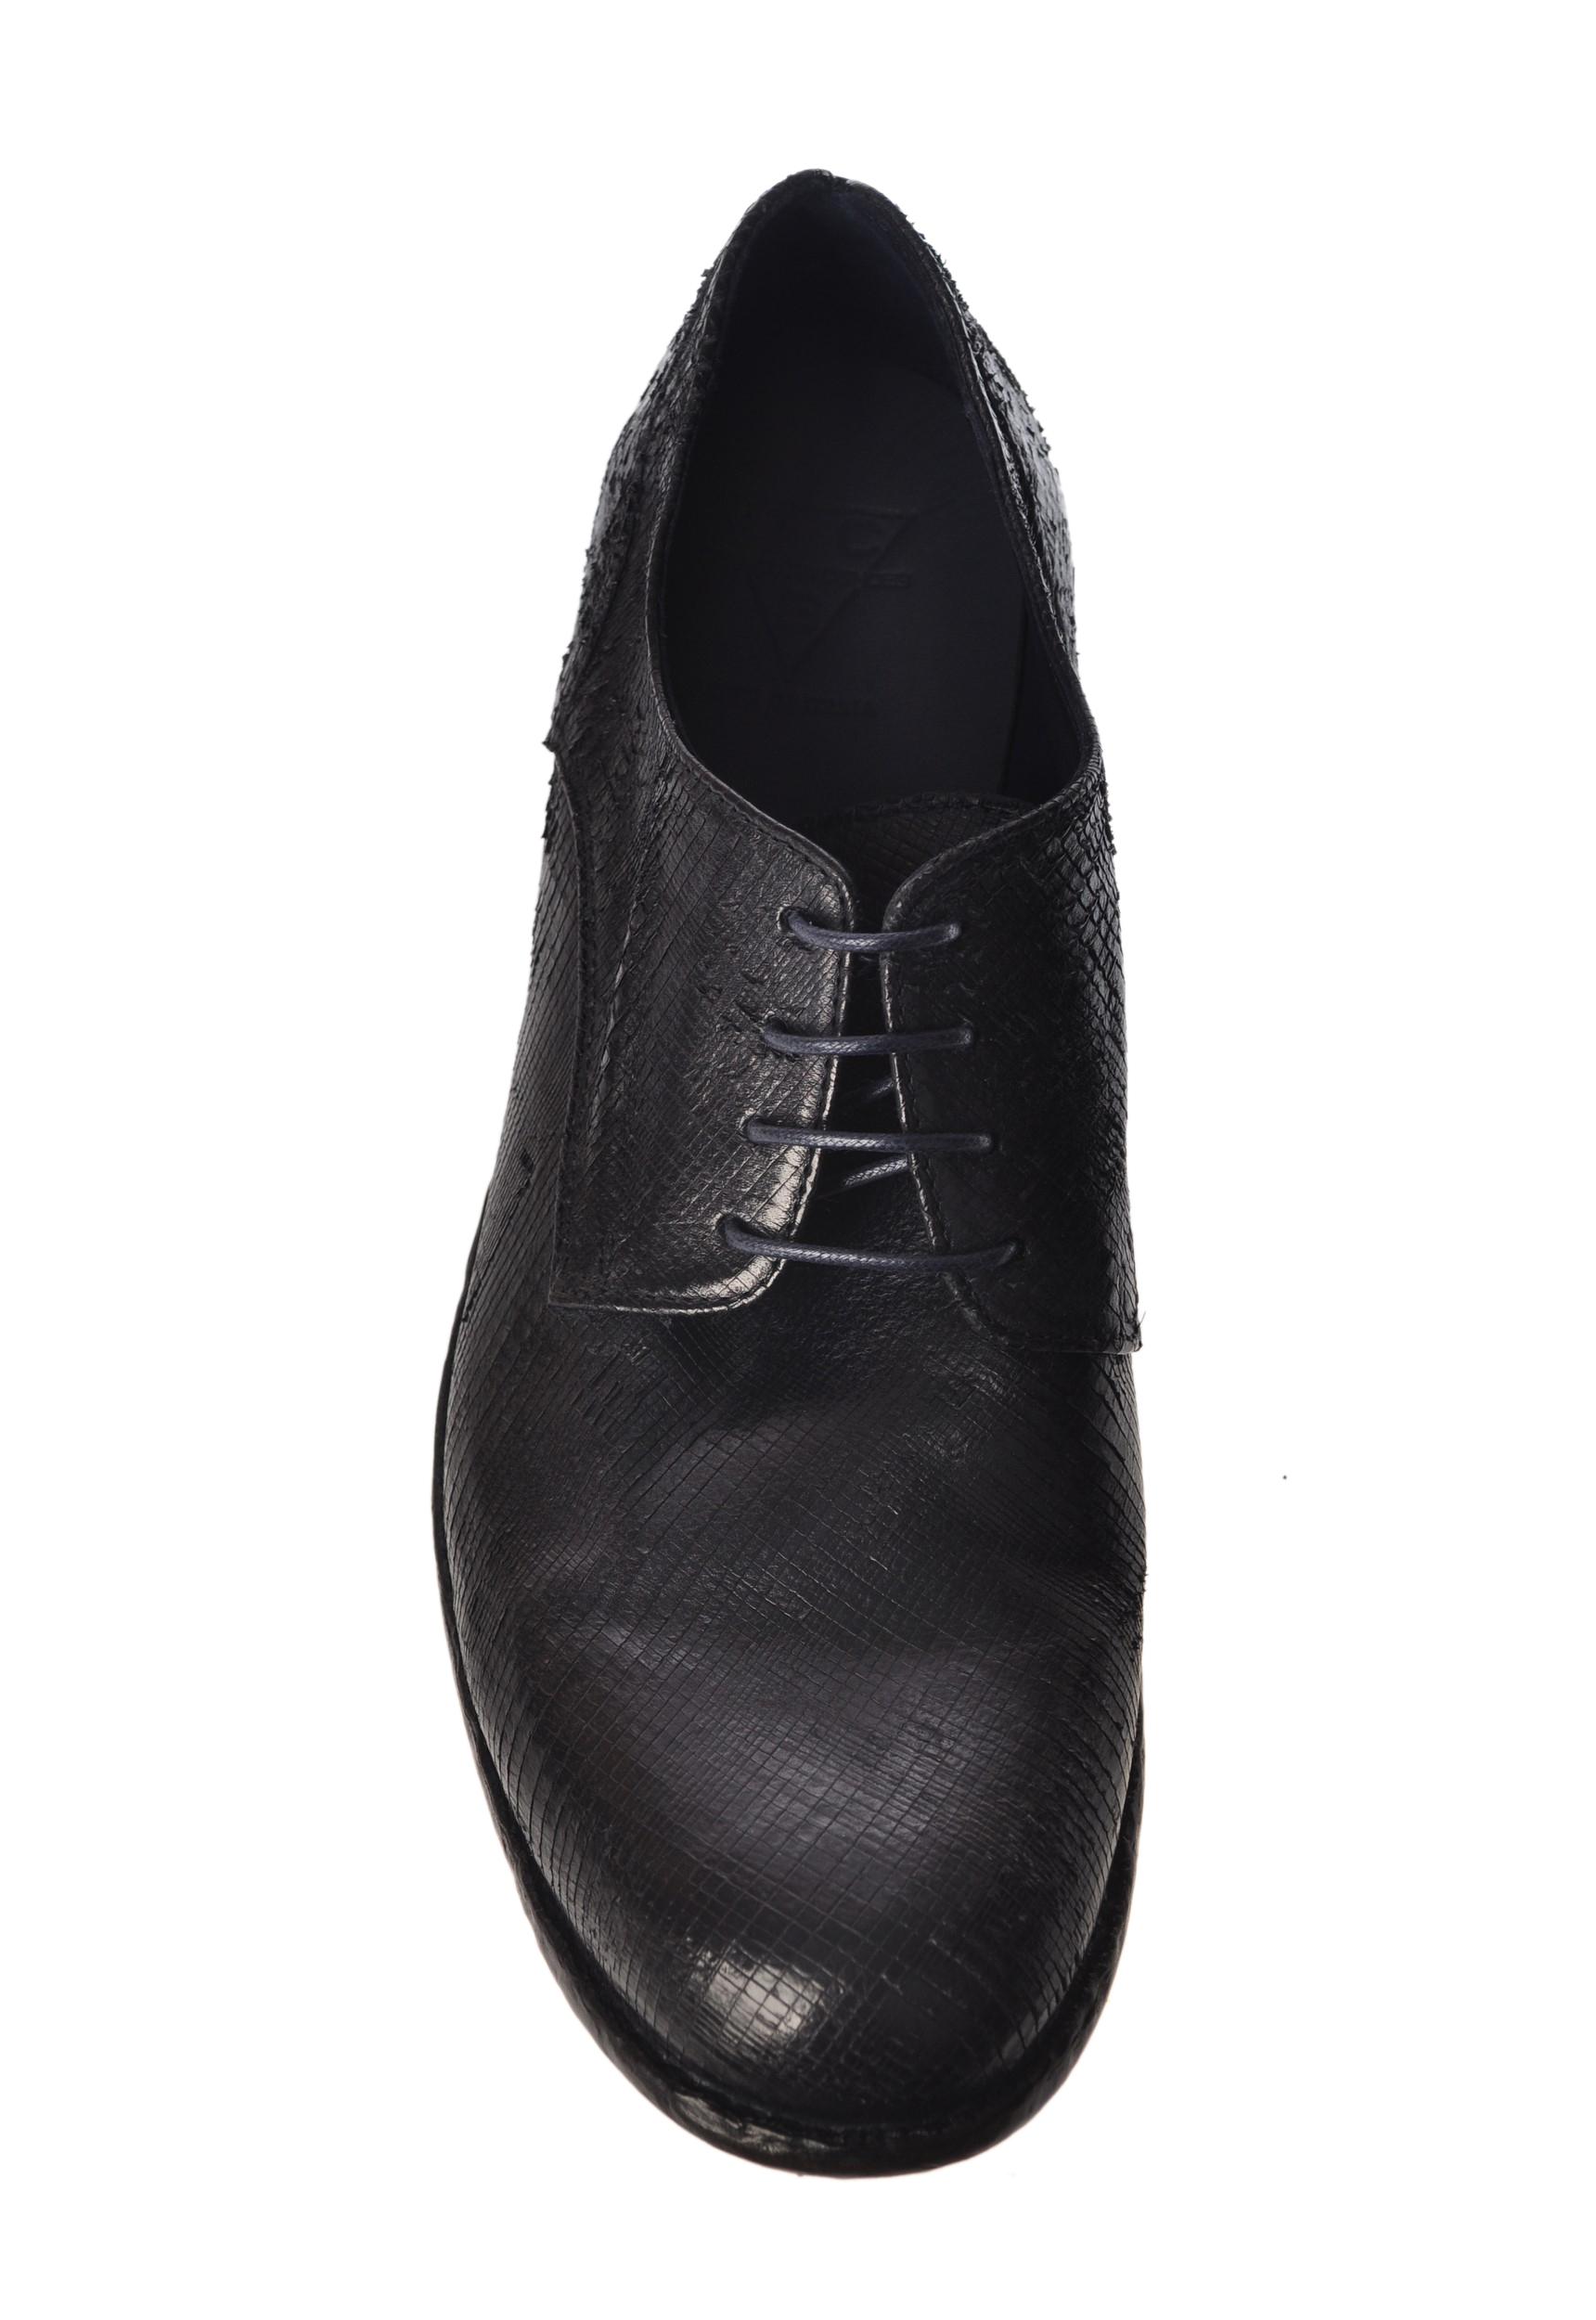 Openclosedshoes - Stringate